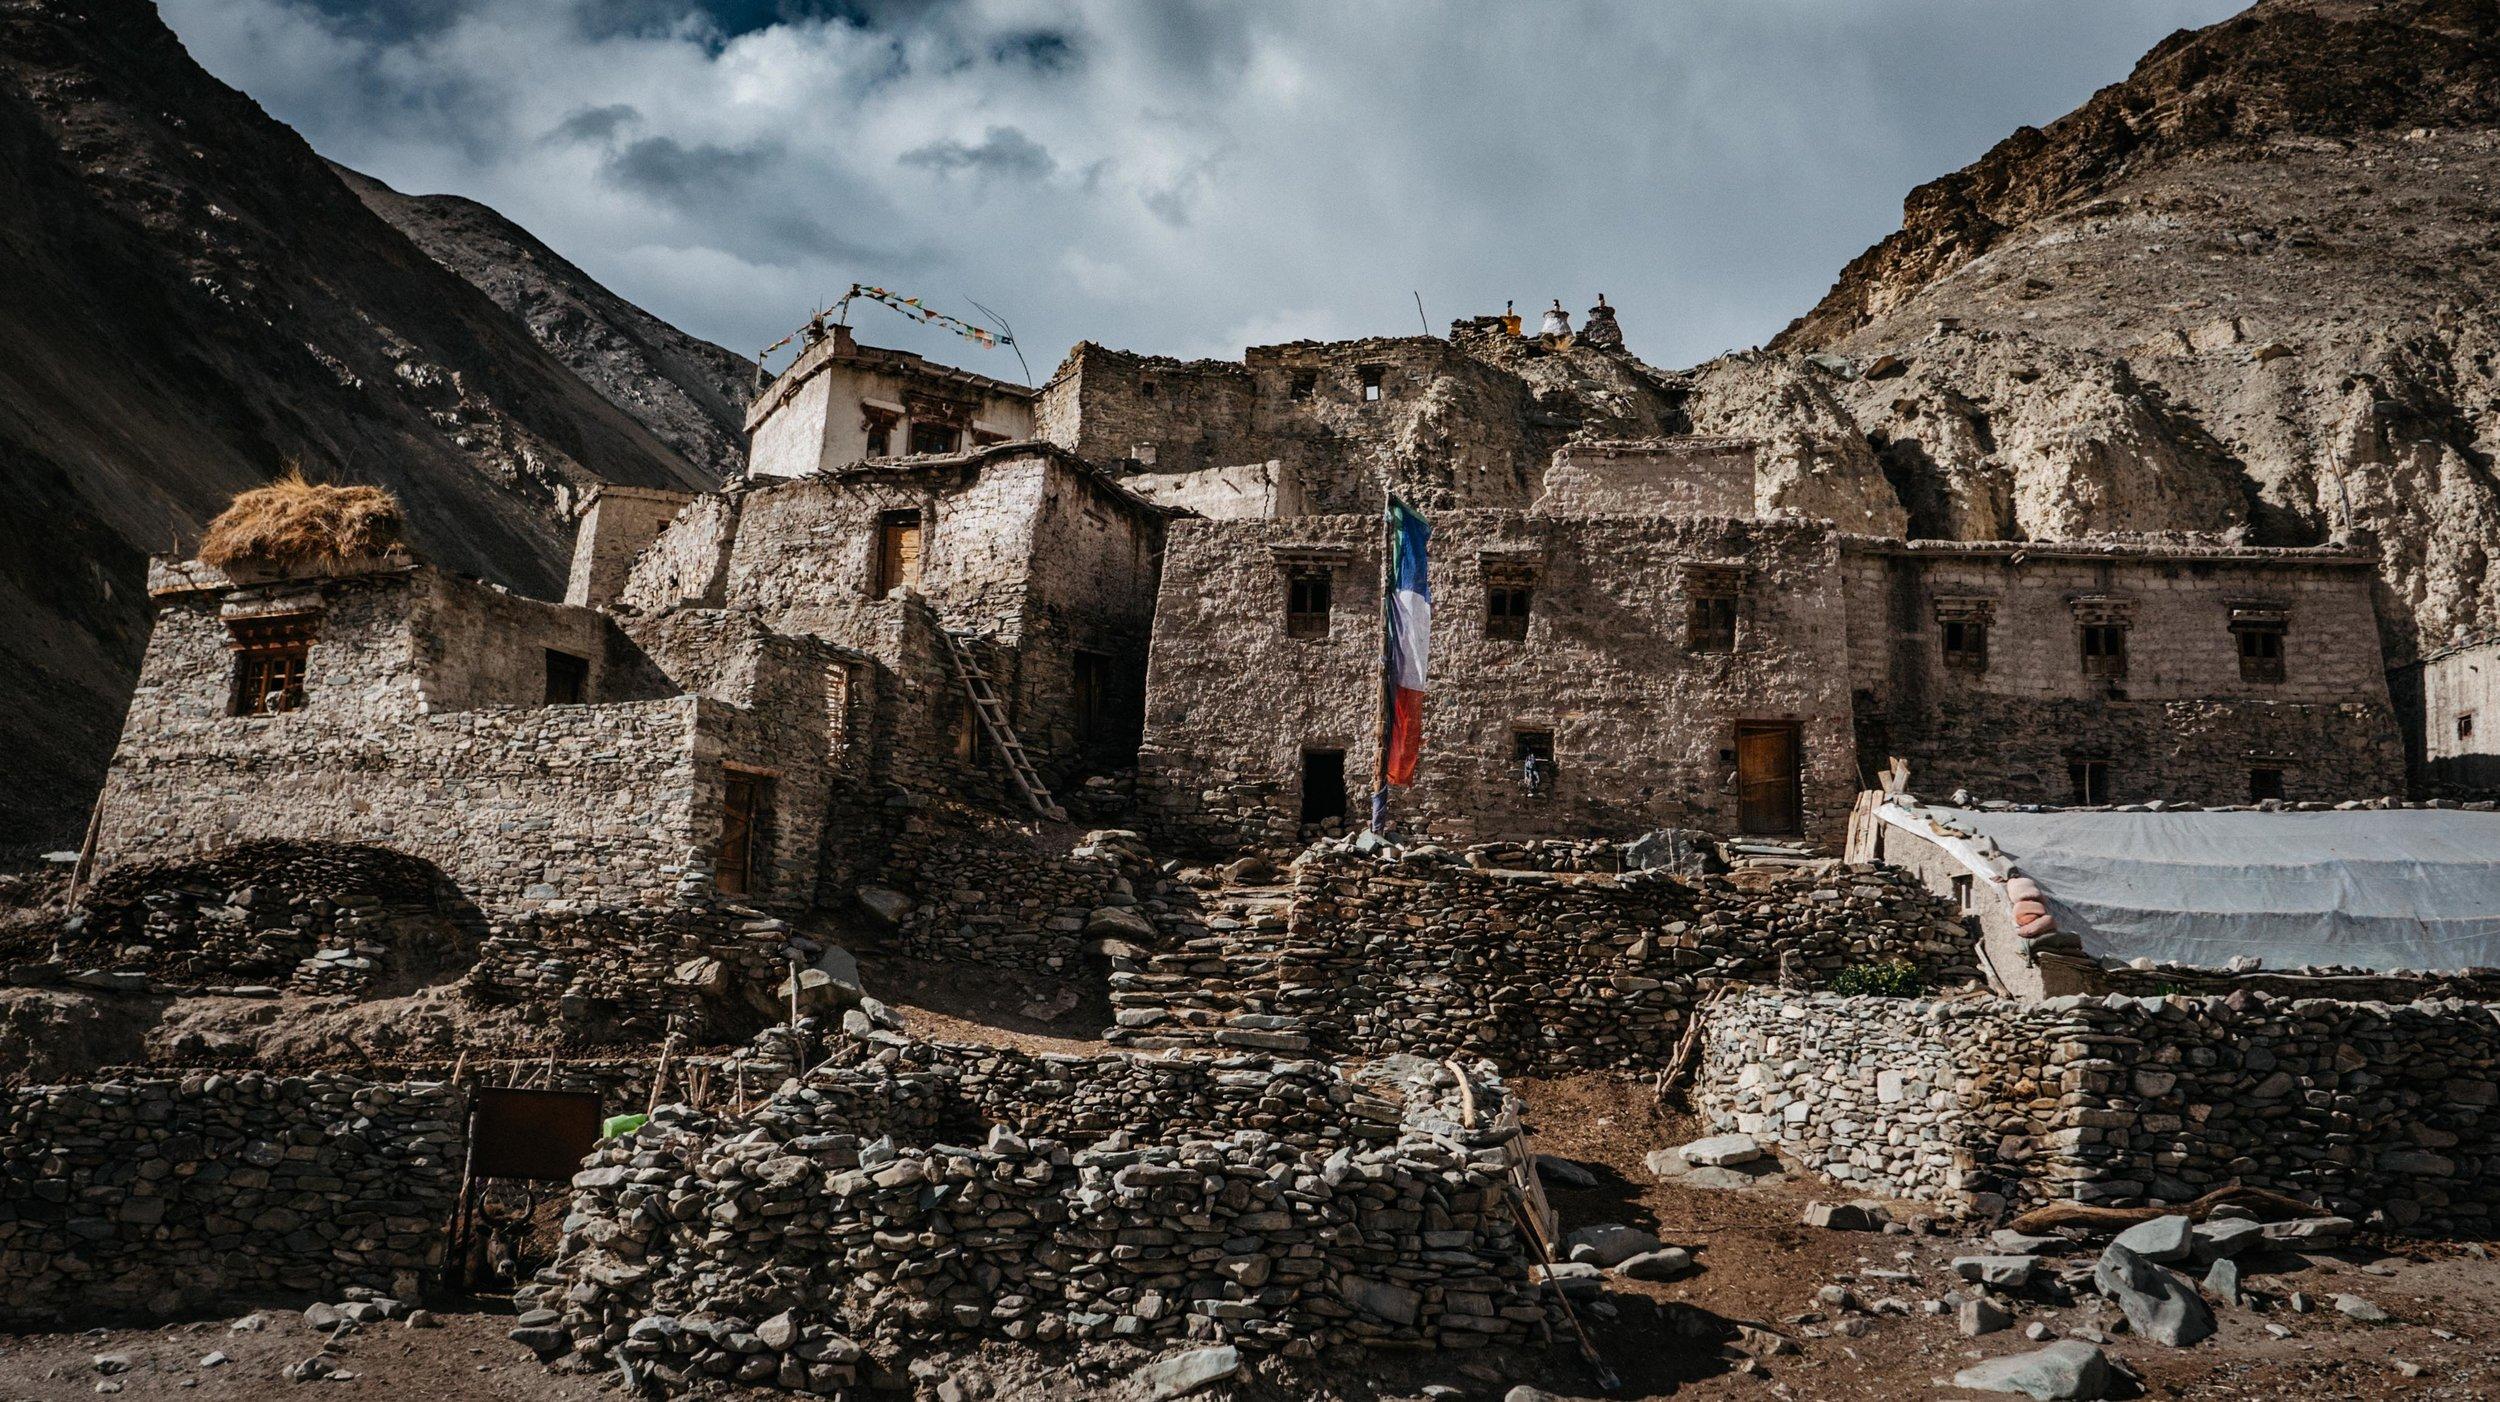 Ladakh - May 2019 - Jammu & Kashmir